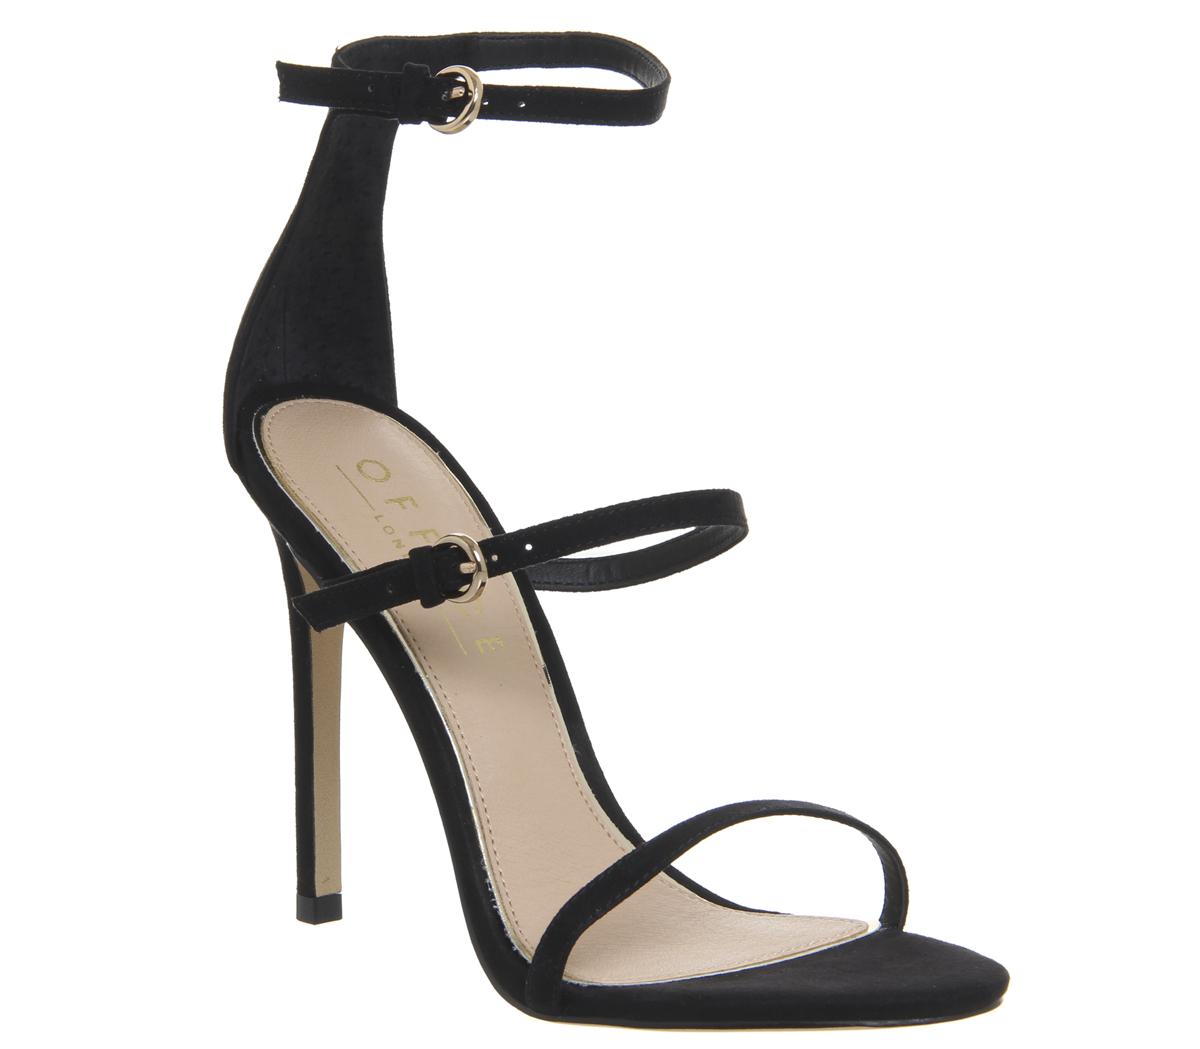 5c689102d74a Sentinel Womens Office Hush 3 Strap Single Sole Heels Black Heels